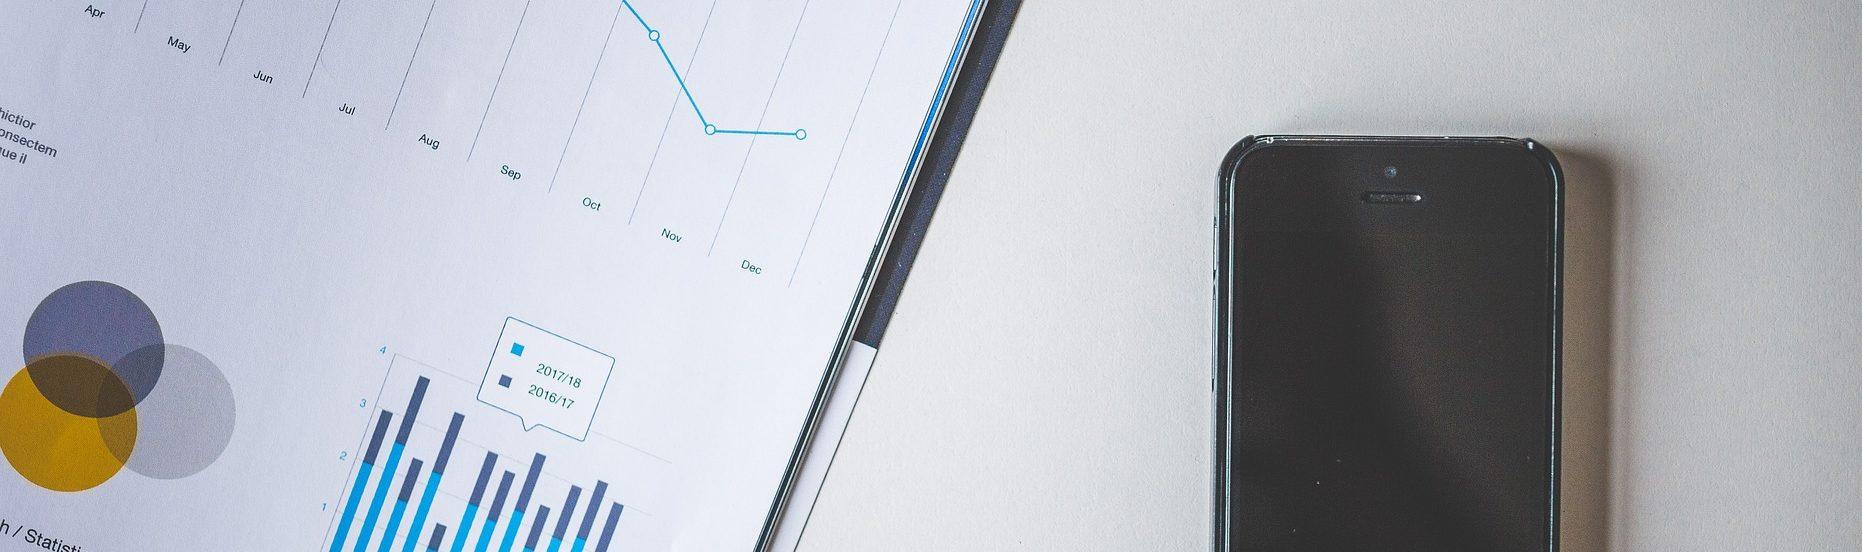 big data search engine optimization